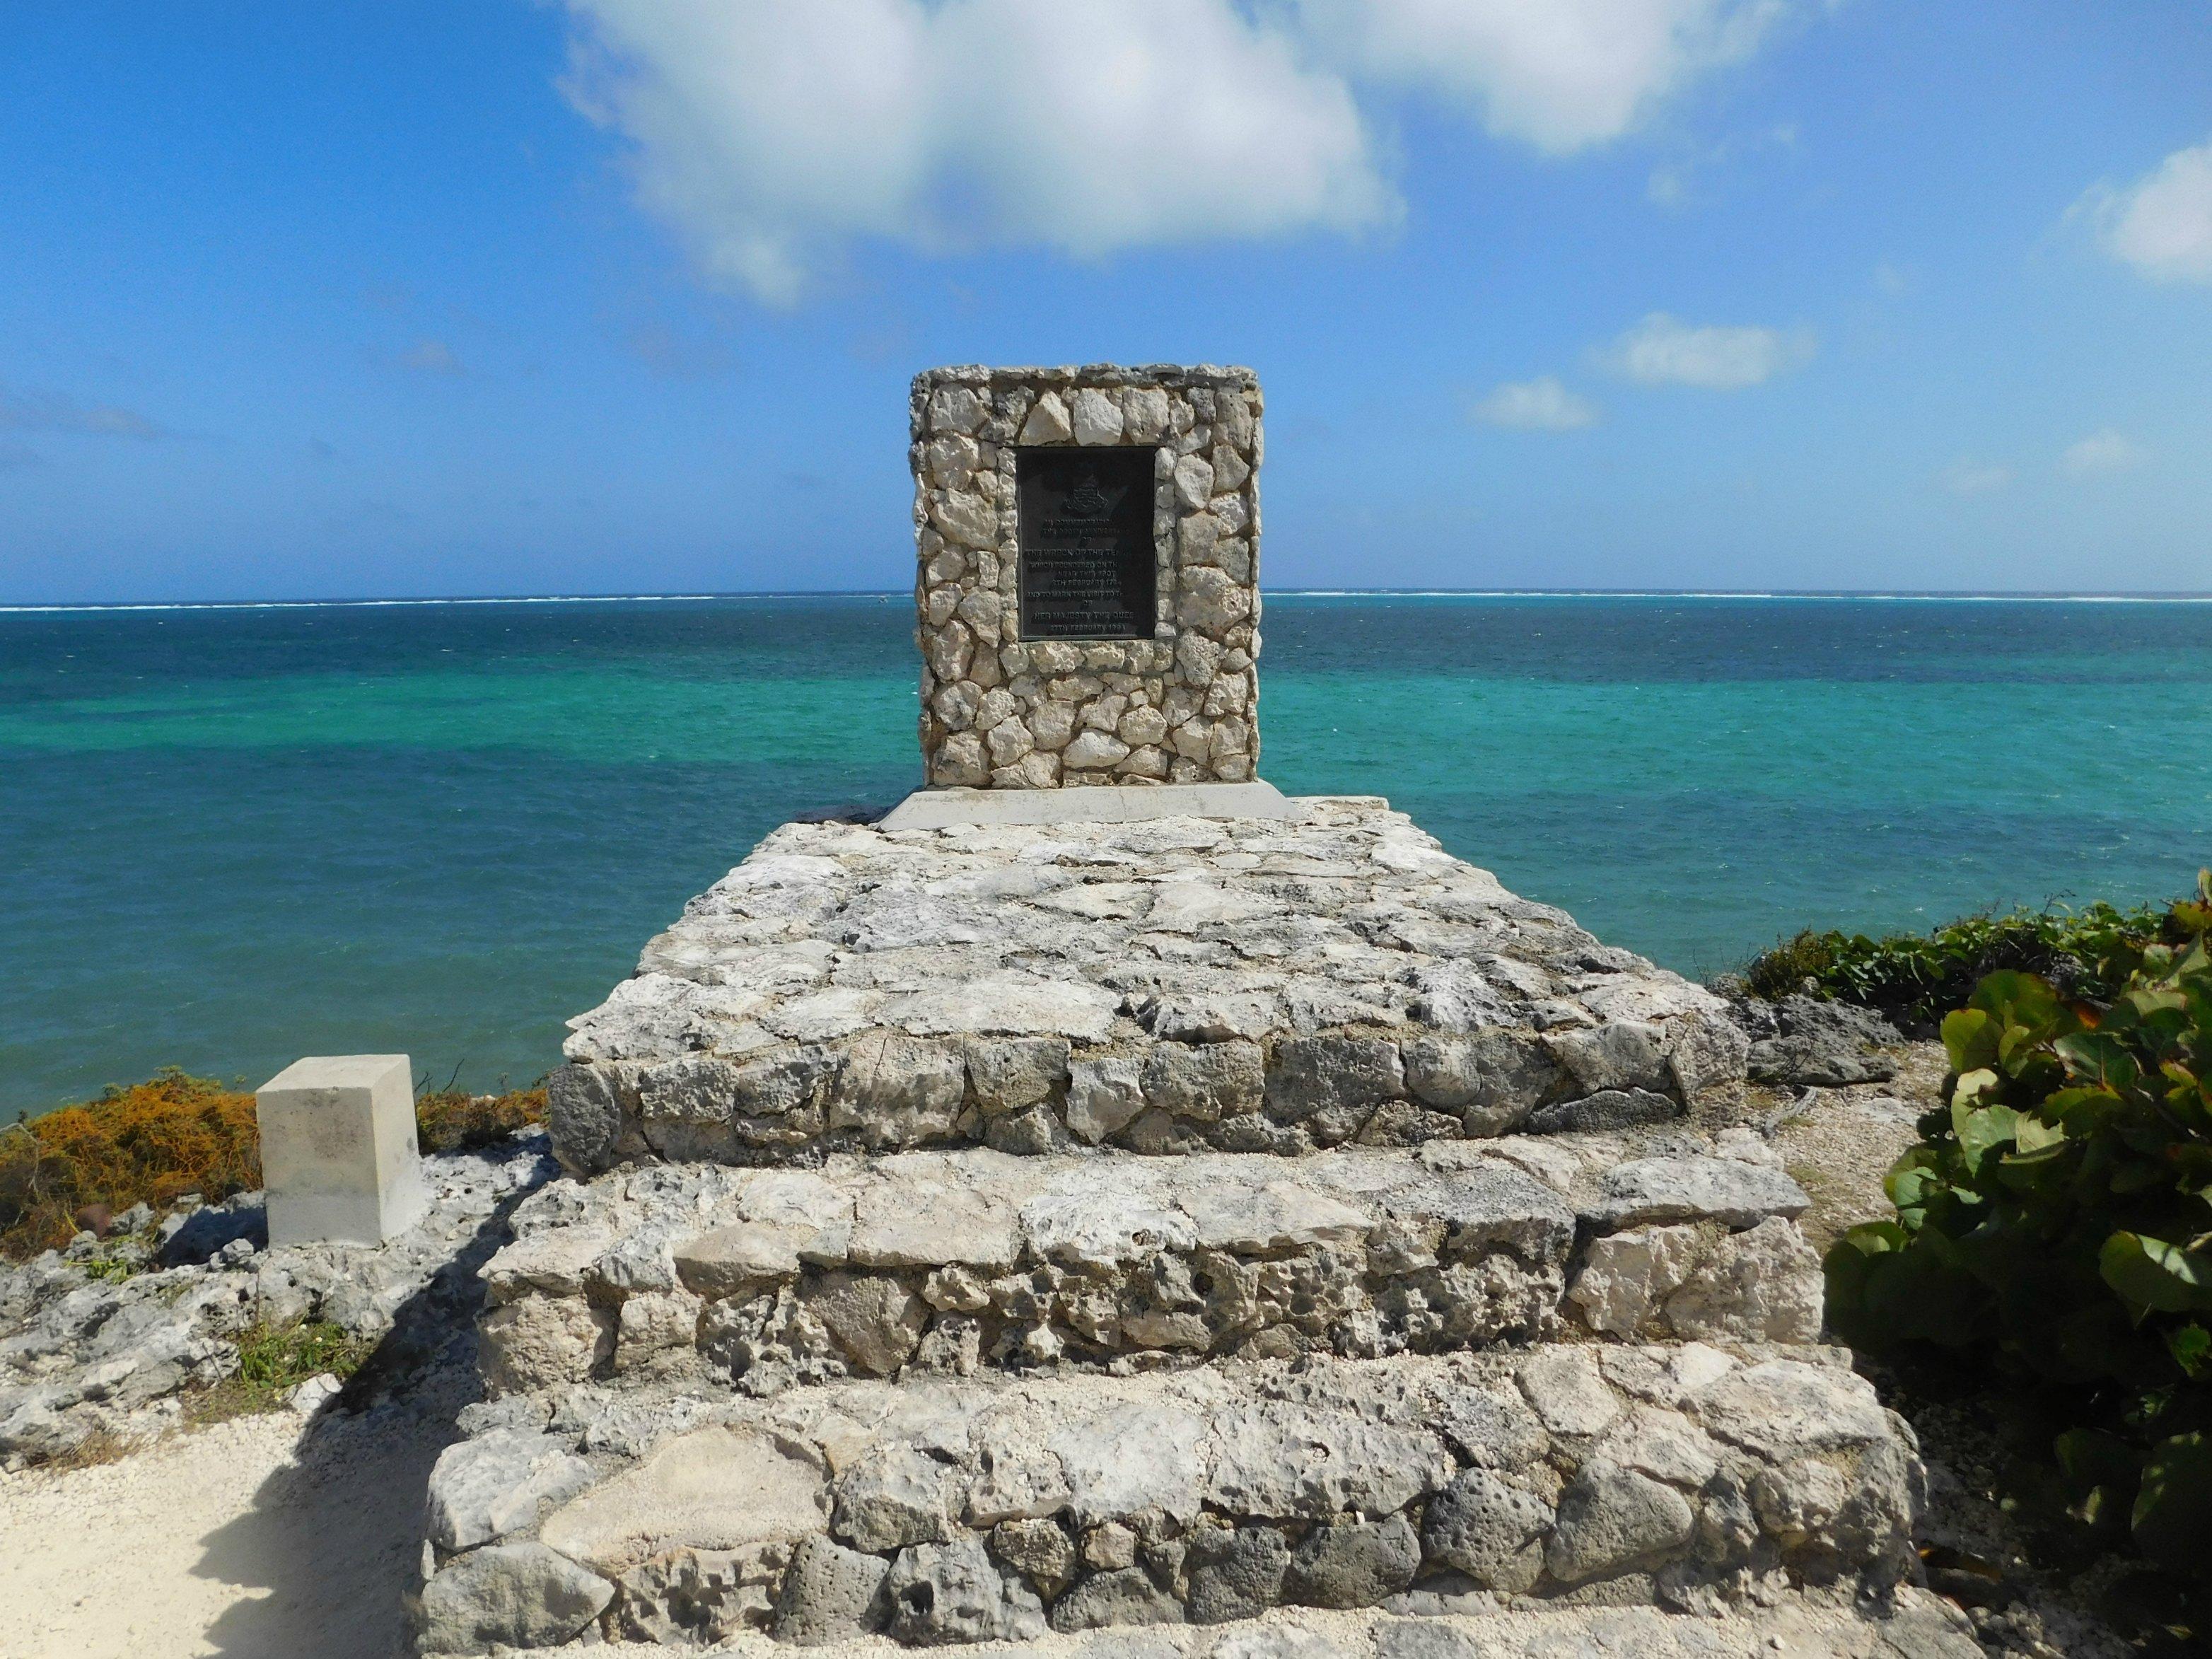 Wreck of the Ten Sails Memorial in Grand Cayman